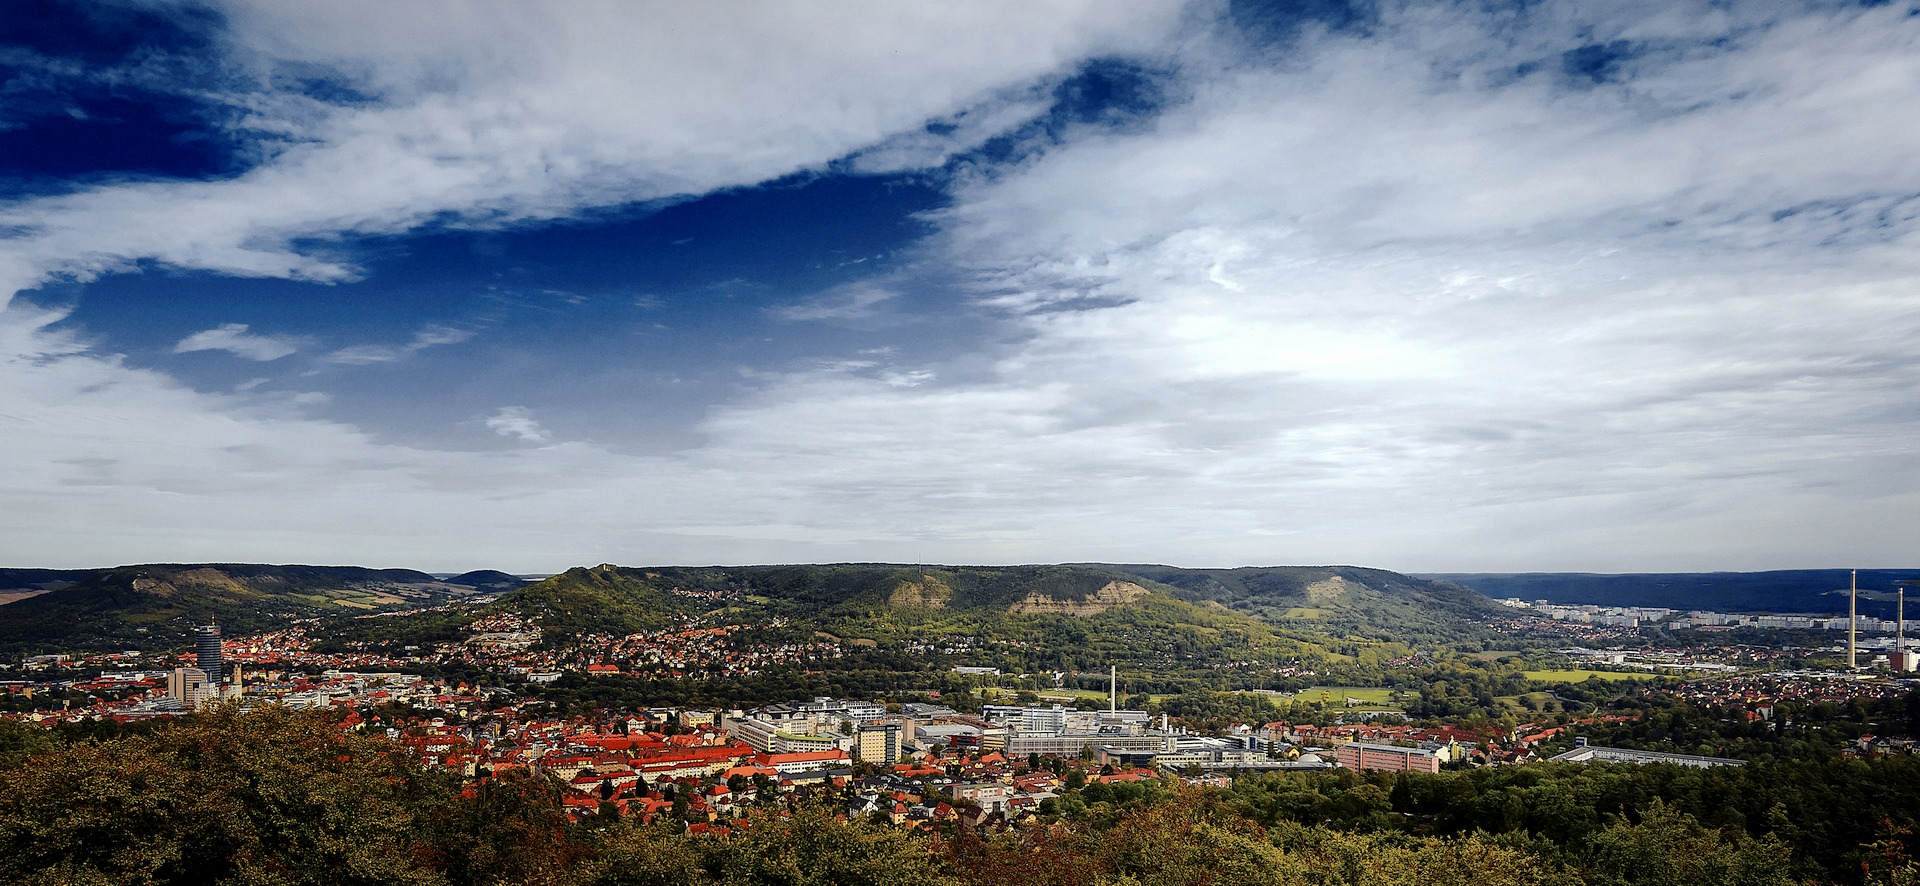 Jena Forstturm Panorama Kodachrome 25